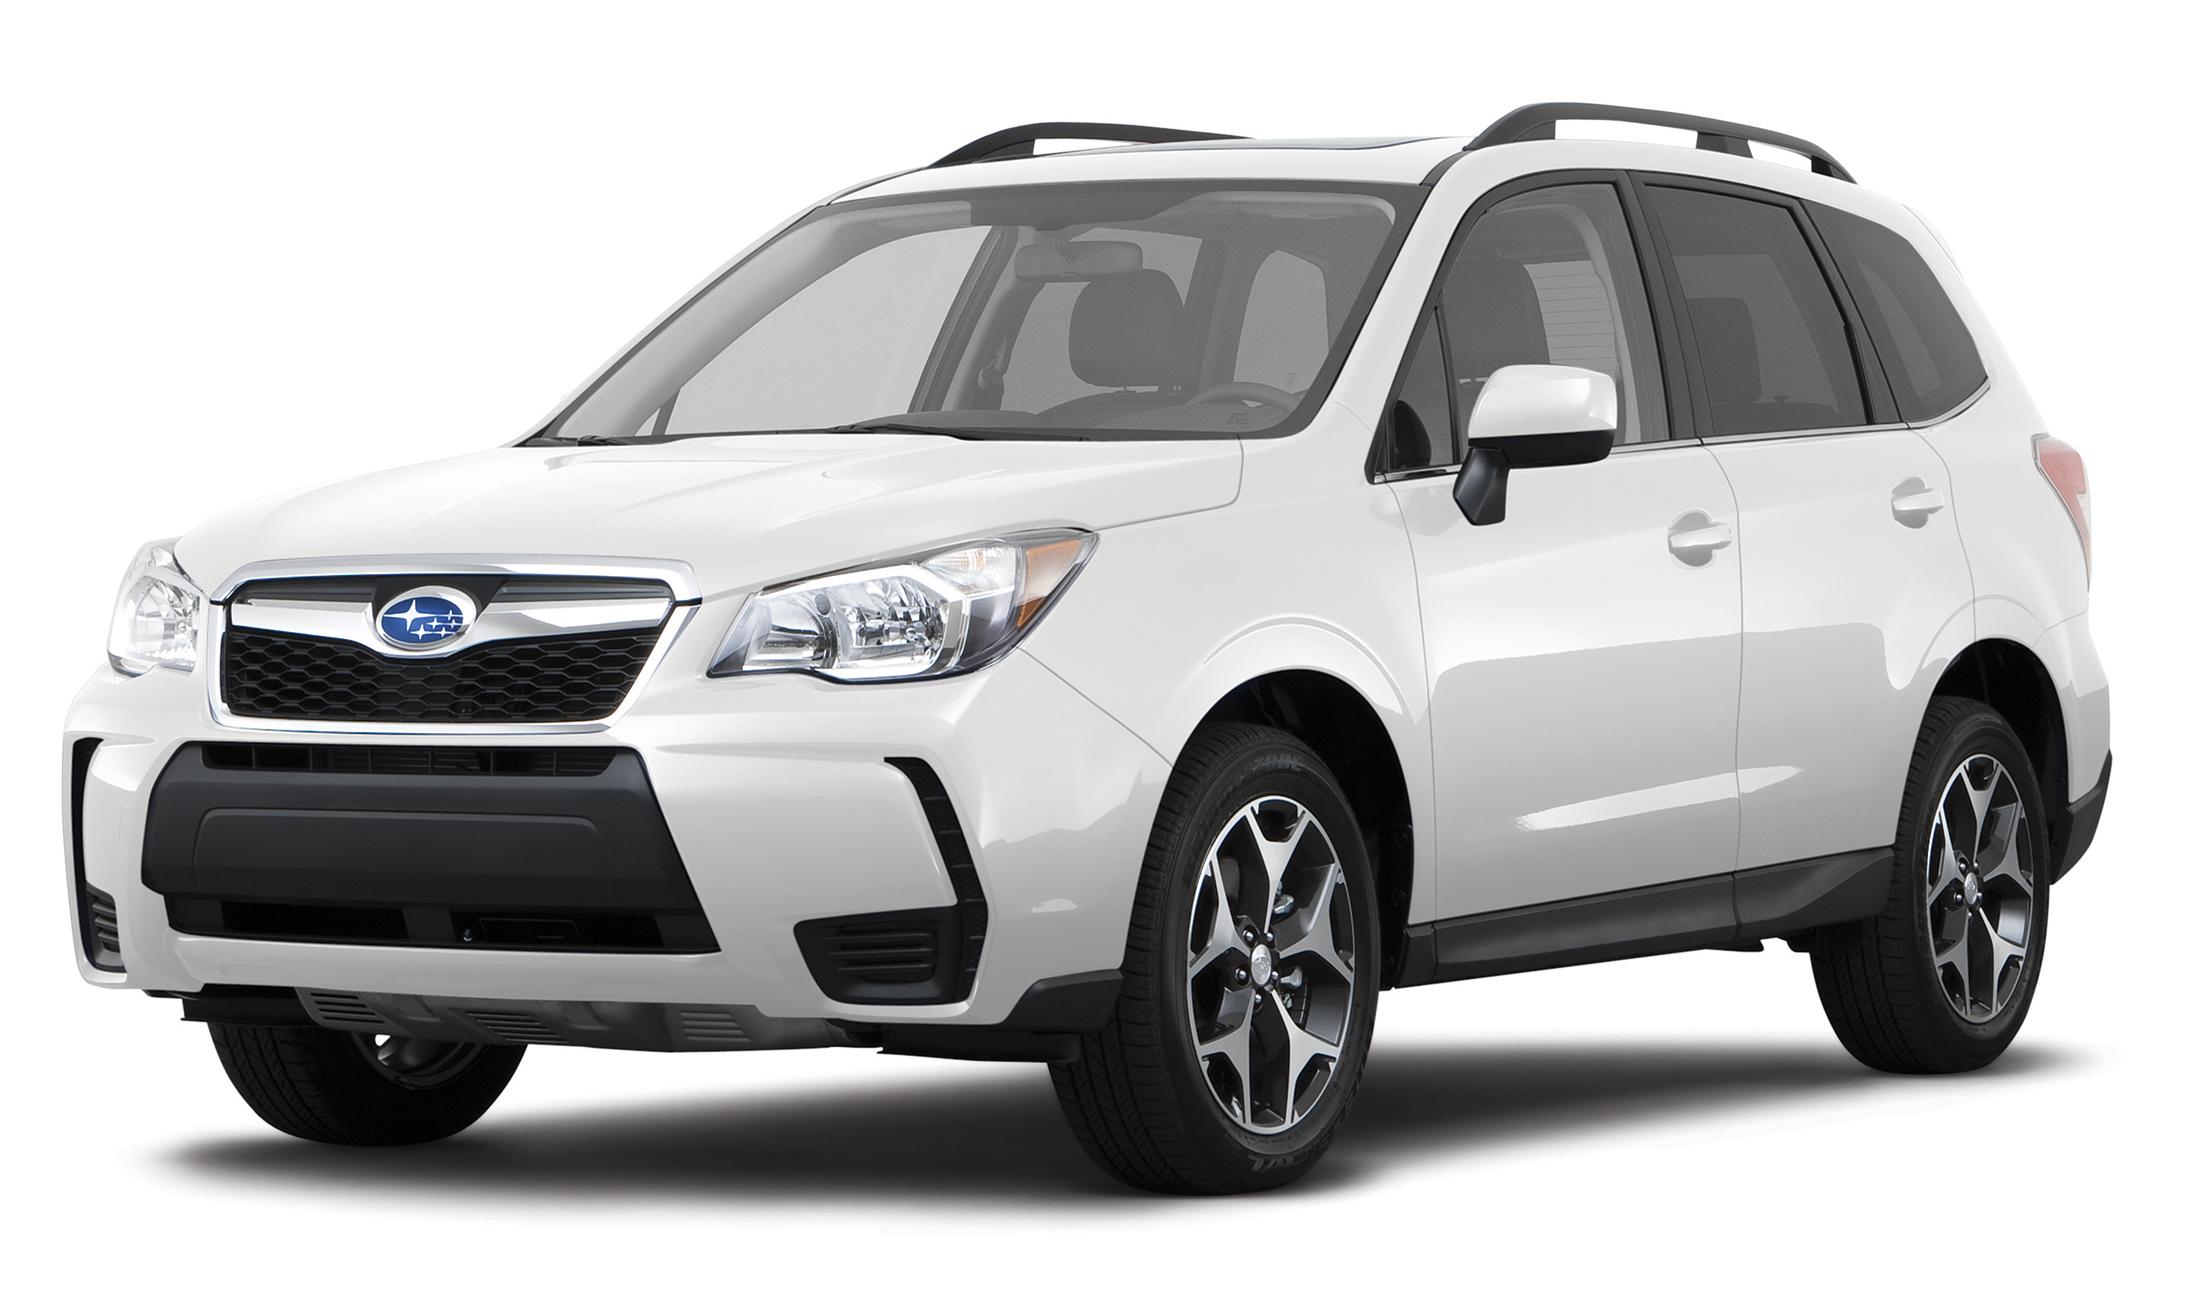 Subaru Premium 2014 >> 2014 SUBARU FORESTER - Image #10